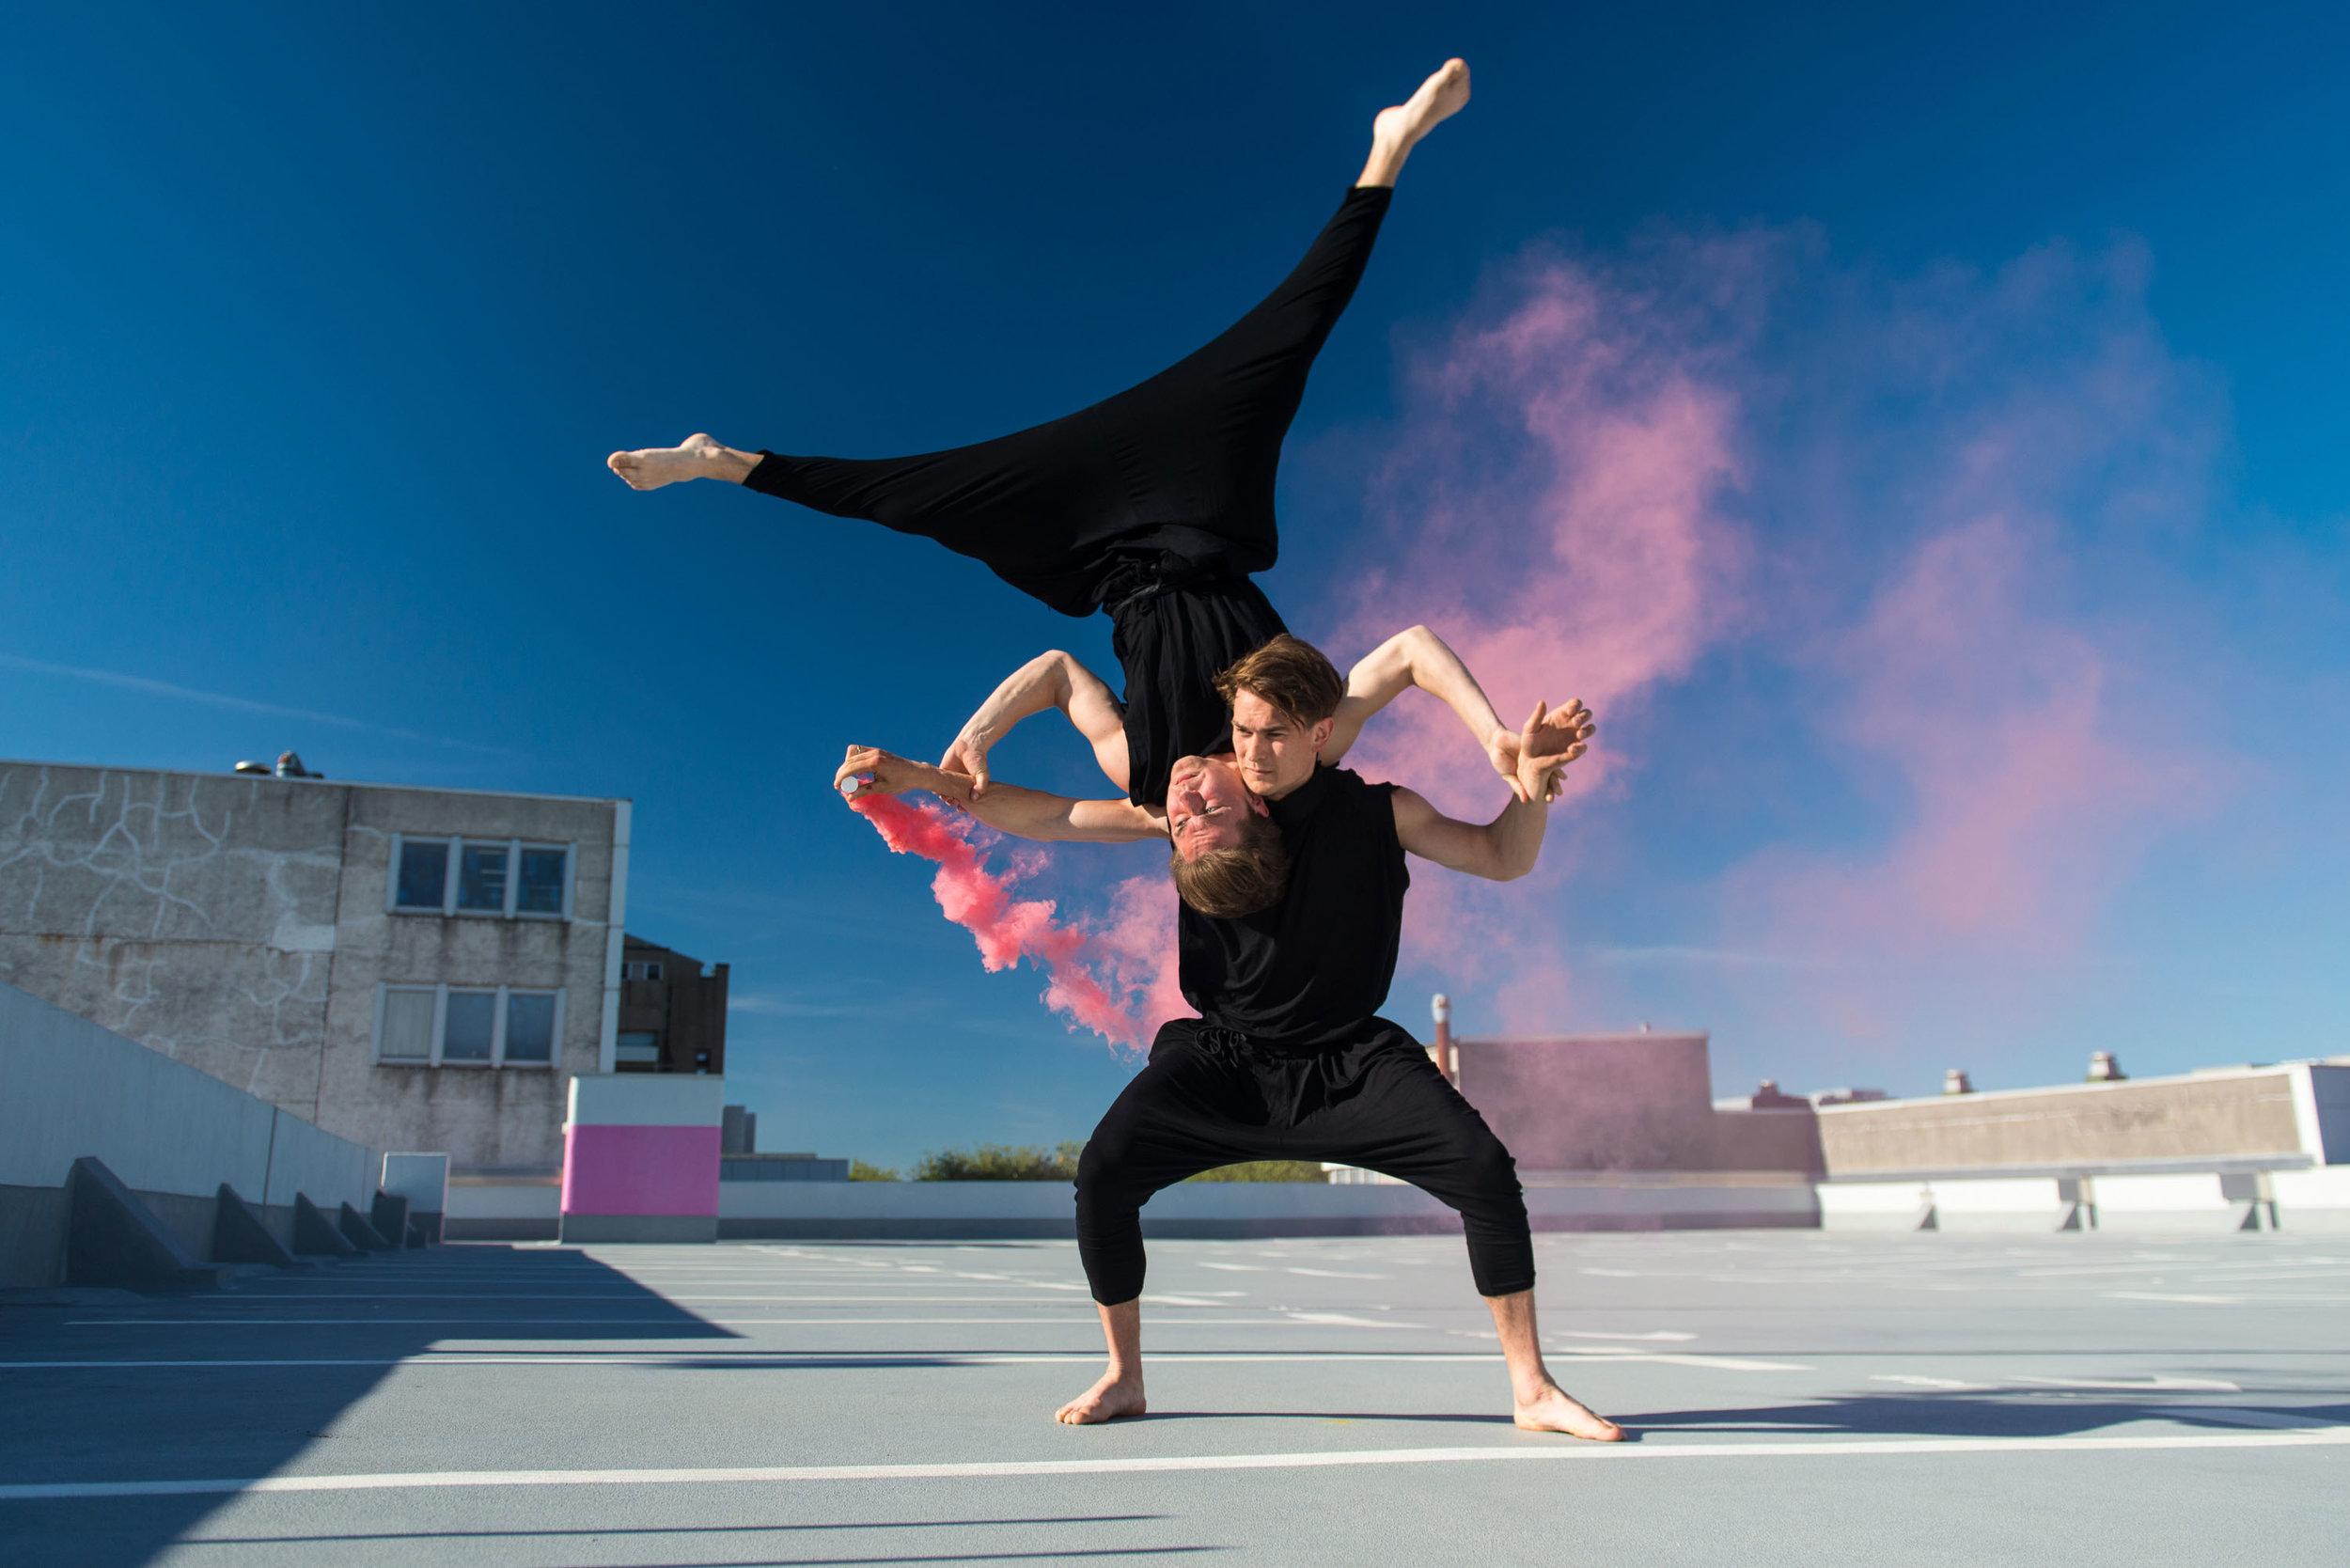 Dennys-Mamero-Photography-Sports-acrobatics-Jim-John-2.jpg